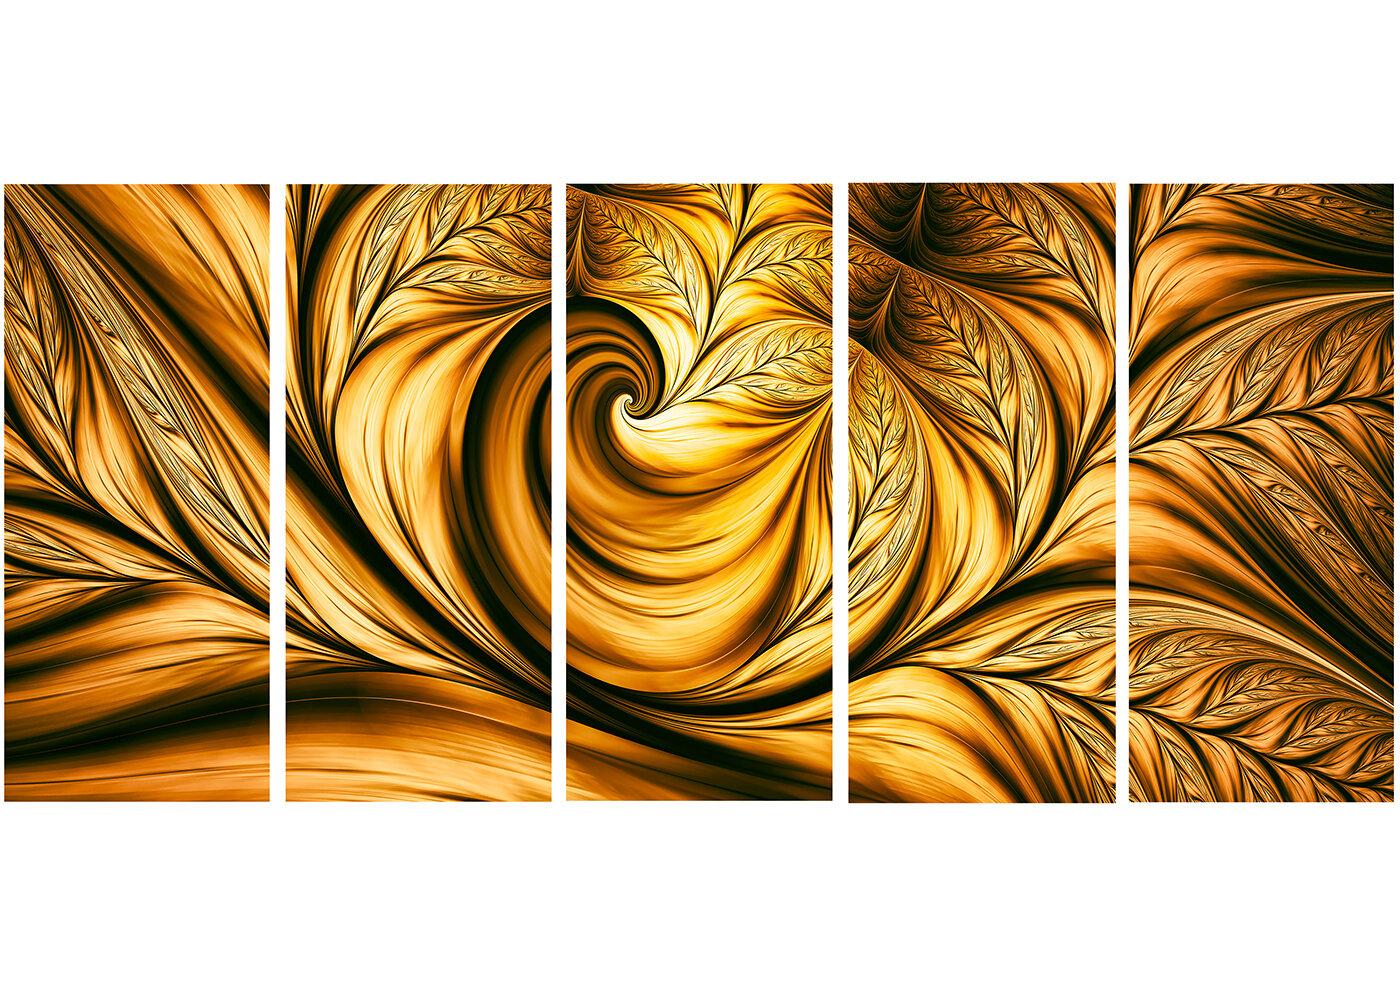 Designart Golden Dream Abstract 5 Piece Graphic Art On Wrapped Canvas Set Wayfair